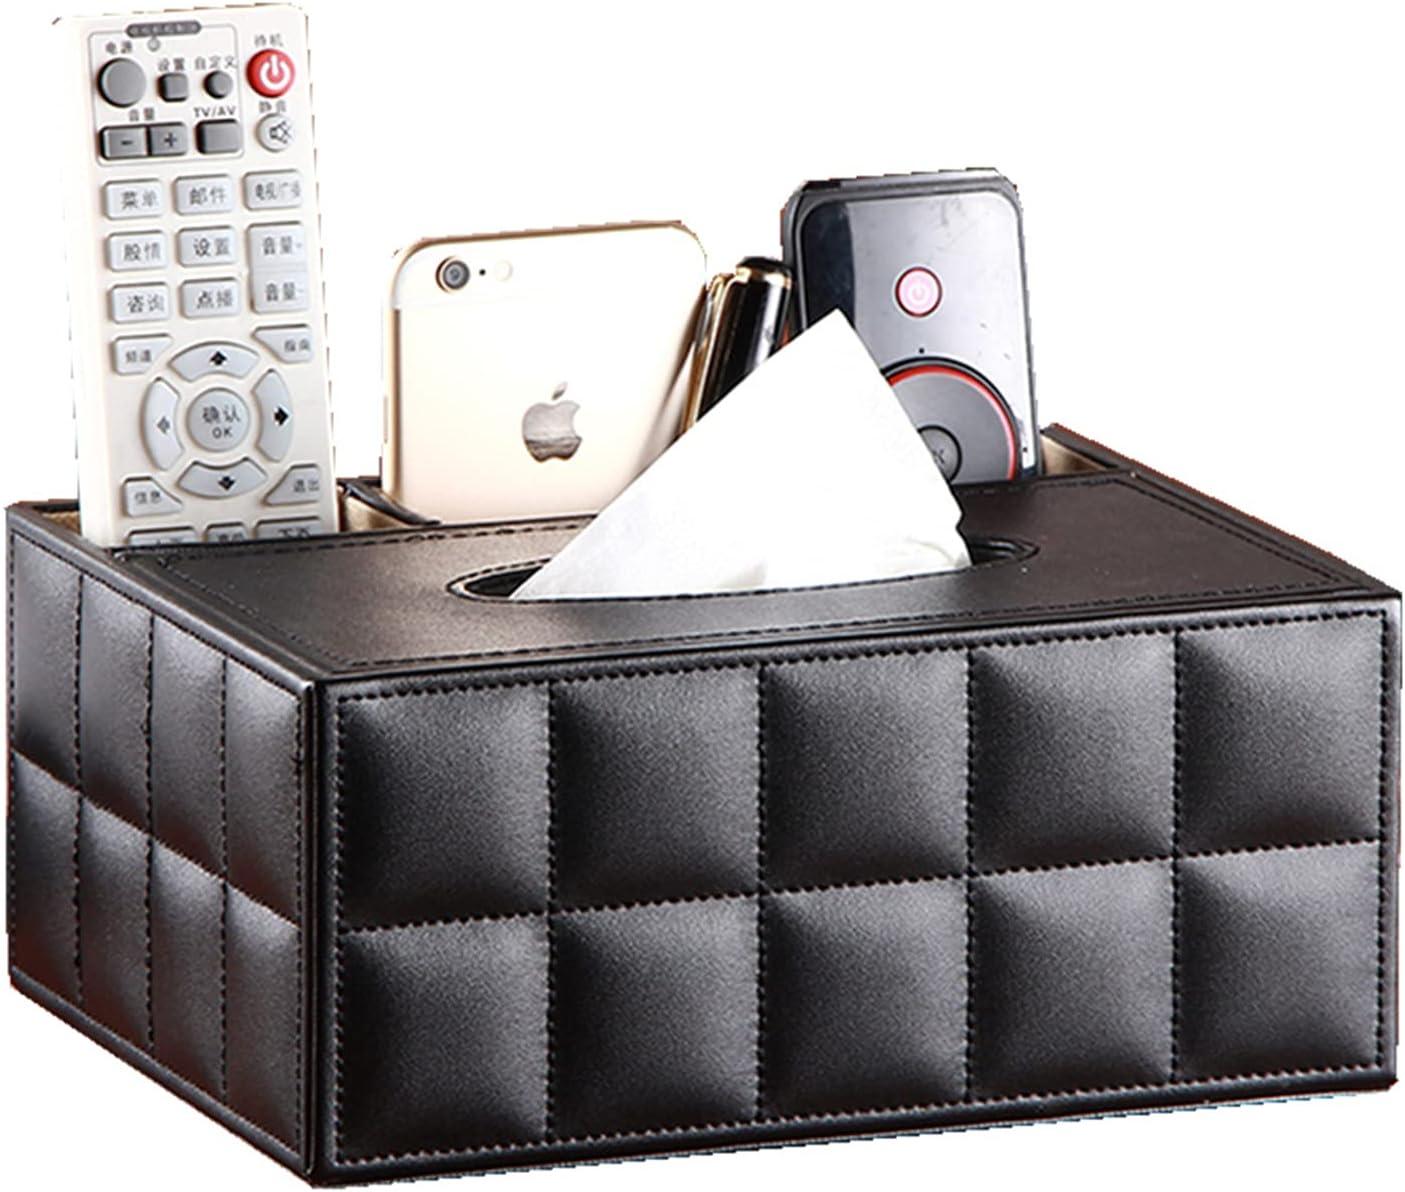 /N SHENGRD Rectangular PU Leather Tissue Box Napkin Holder ,Multifunction Home Office Supplies Decoration Hotel Paper Box Napkin Holder (Black Grid)